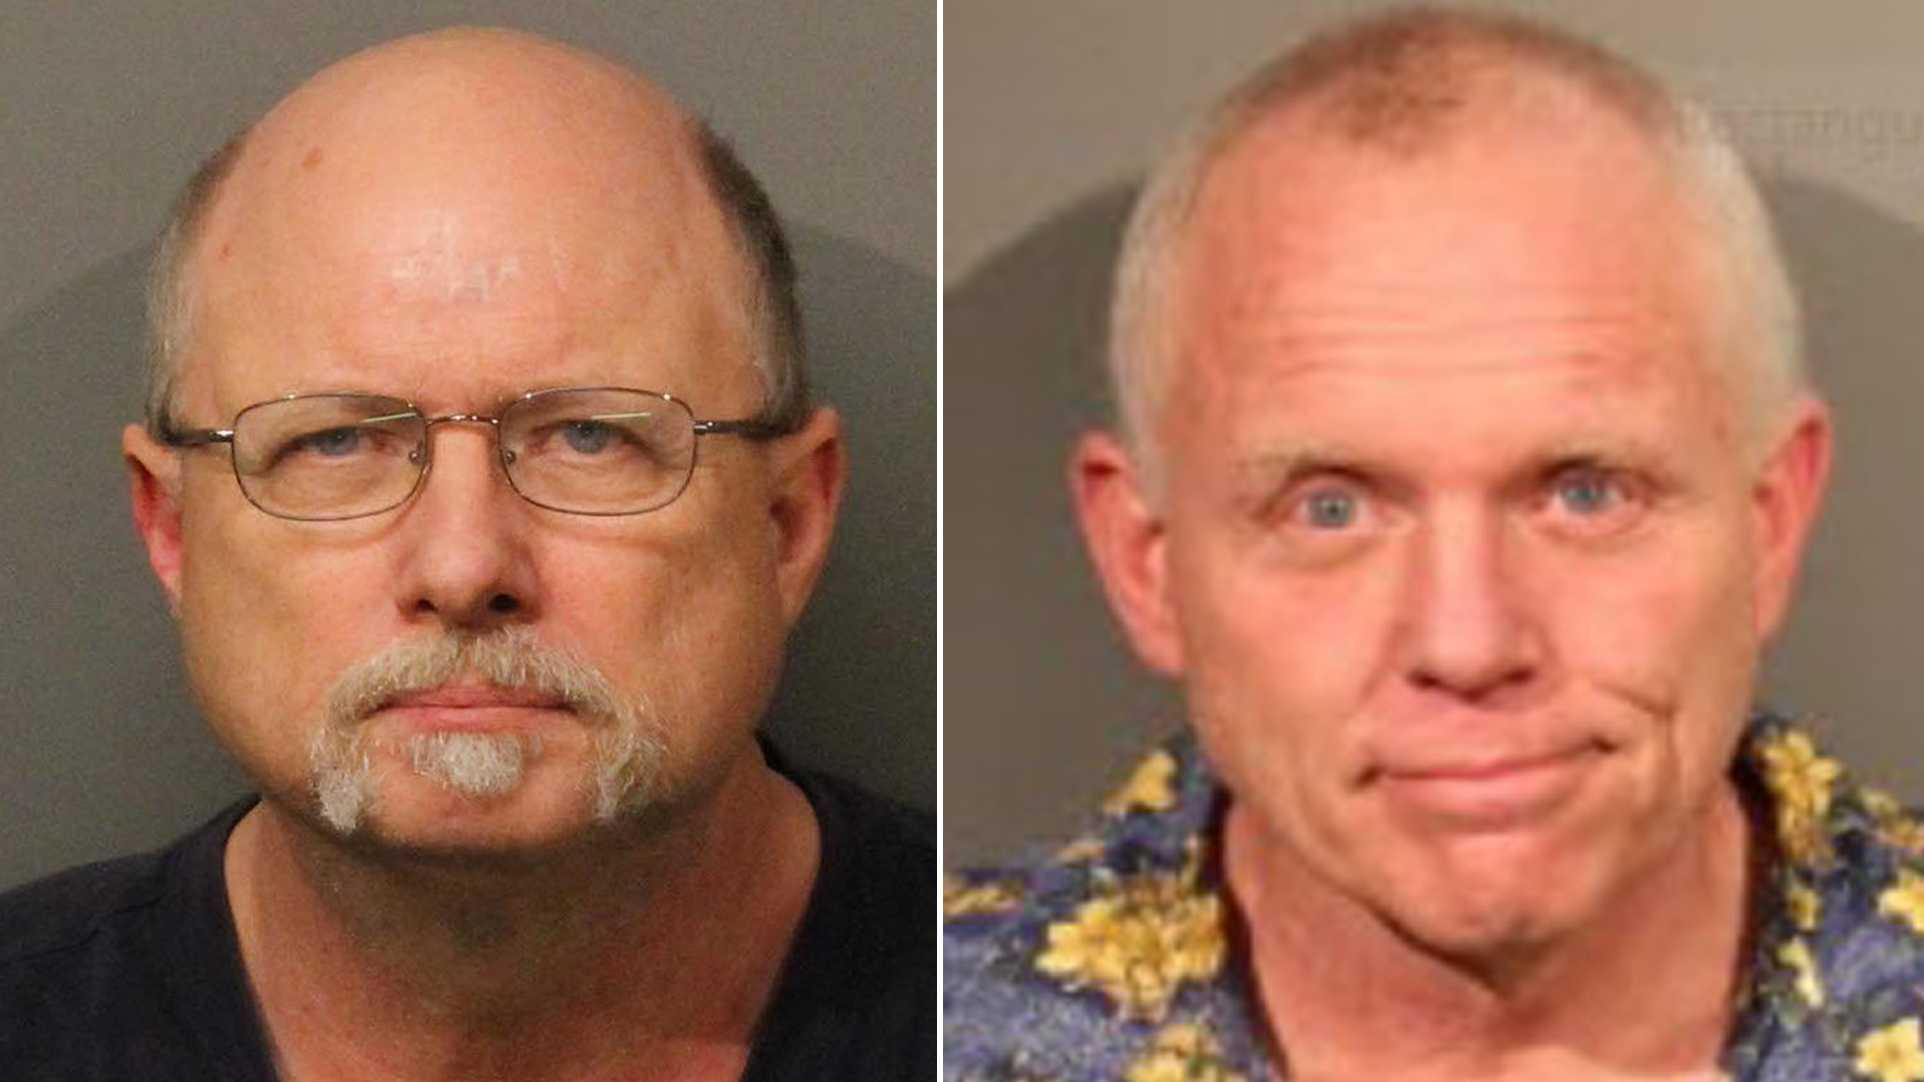 Gary Arlen Folkerts, 57, and Larry Gene Folkerts, 56